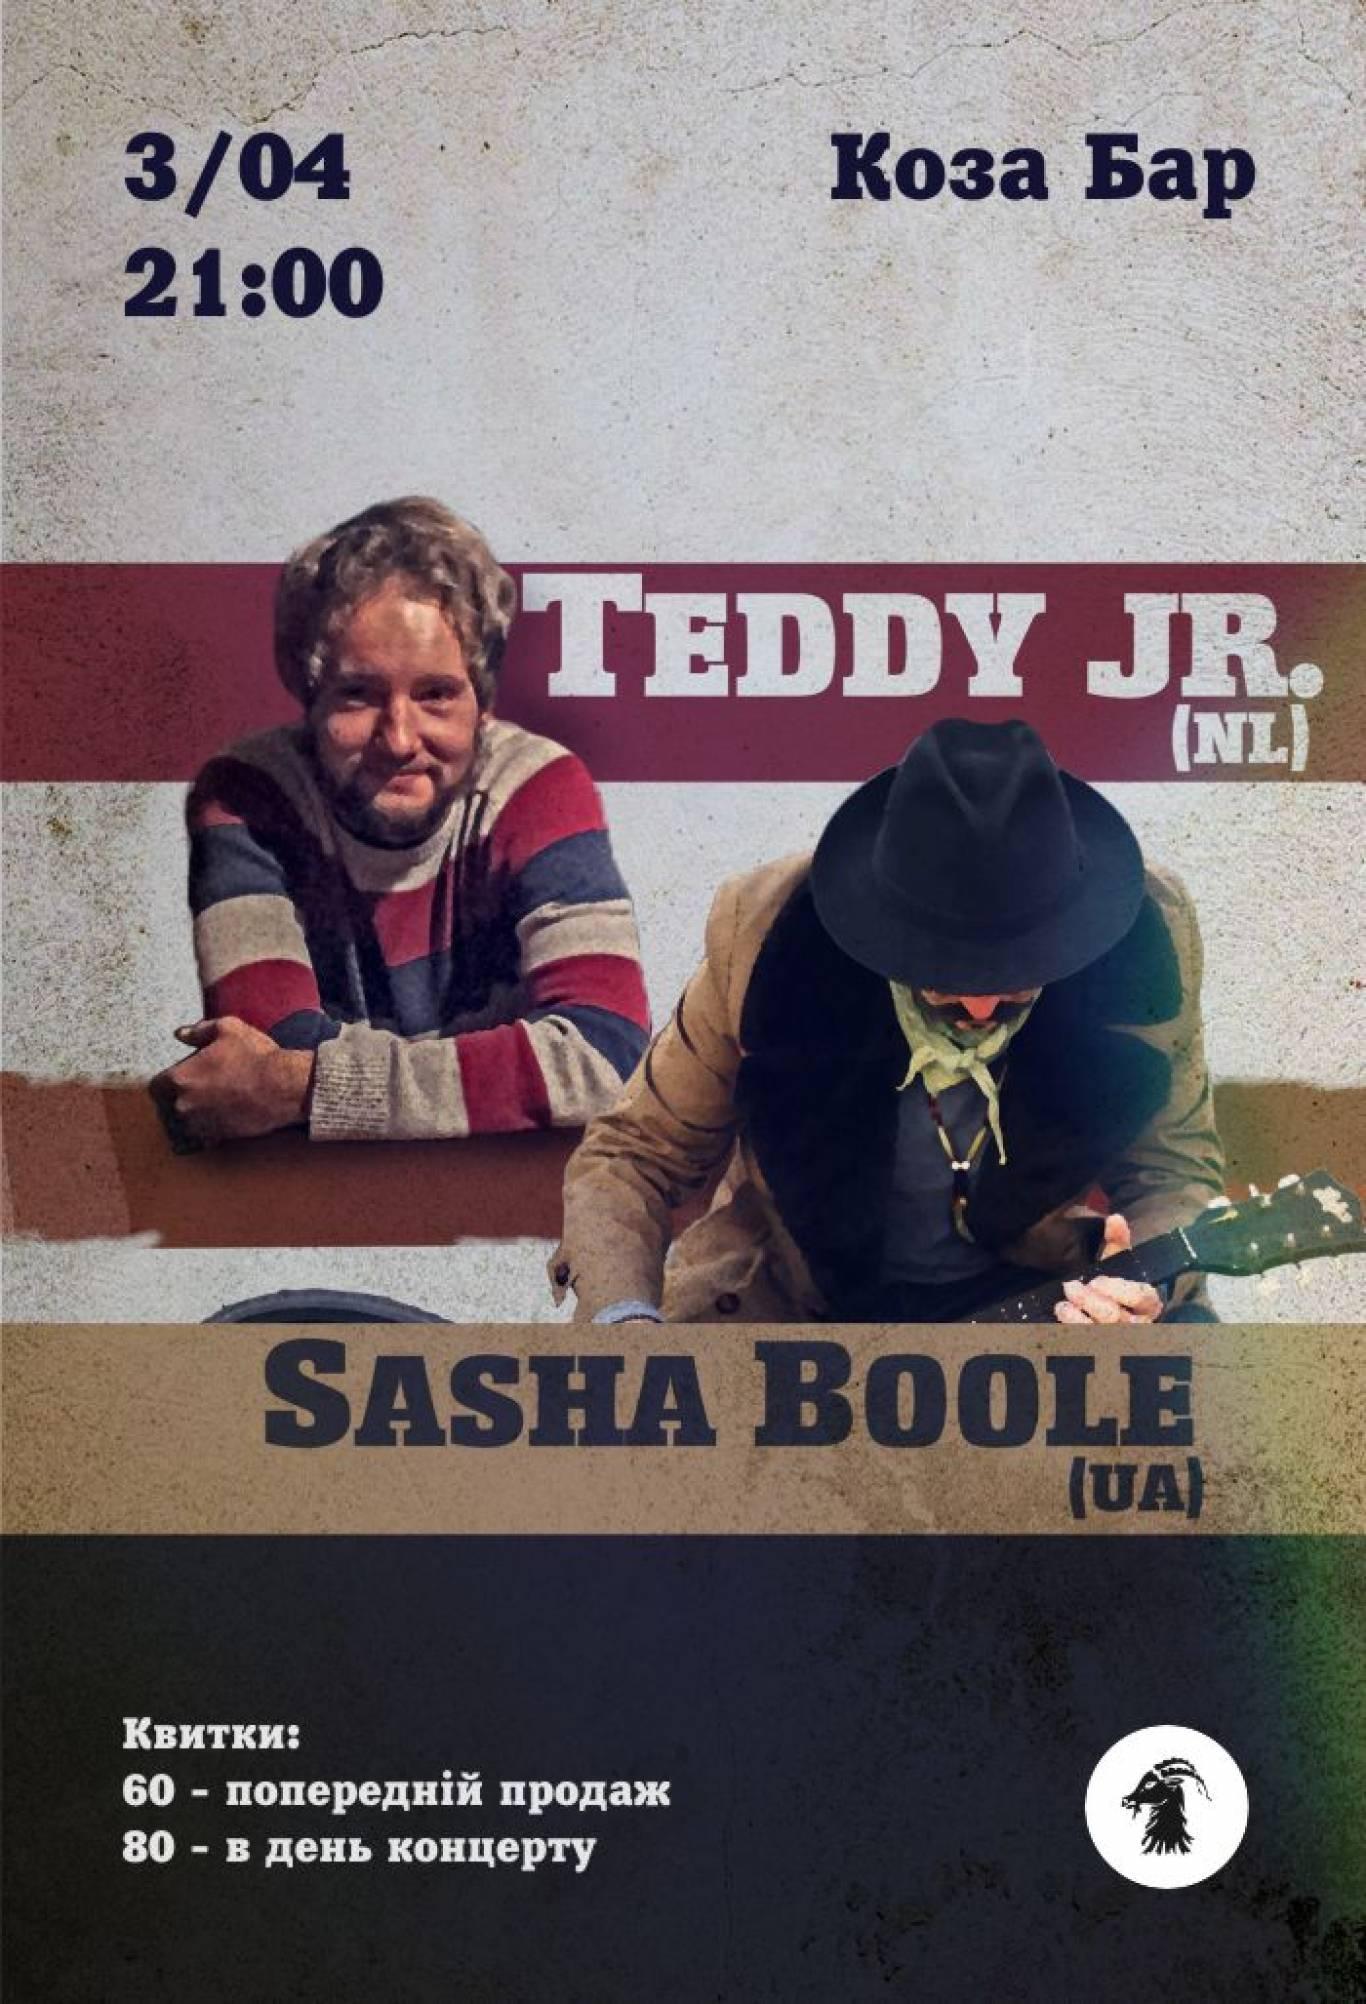 Концерт Sasha Boole та Teddy Jr. Duo